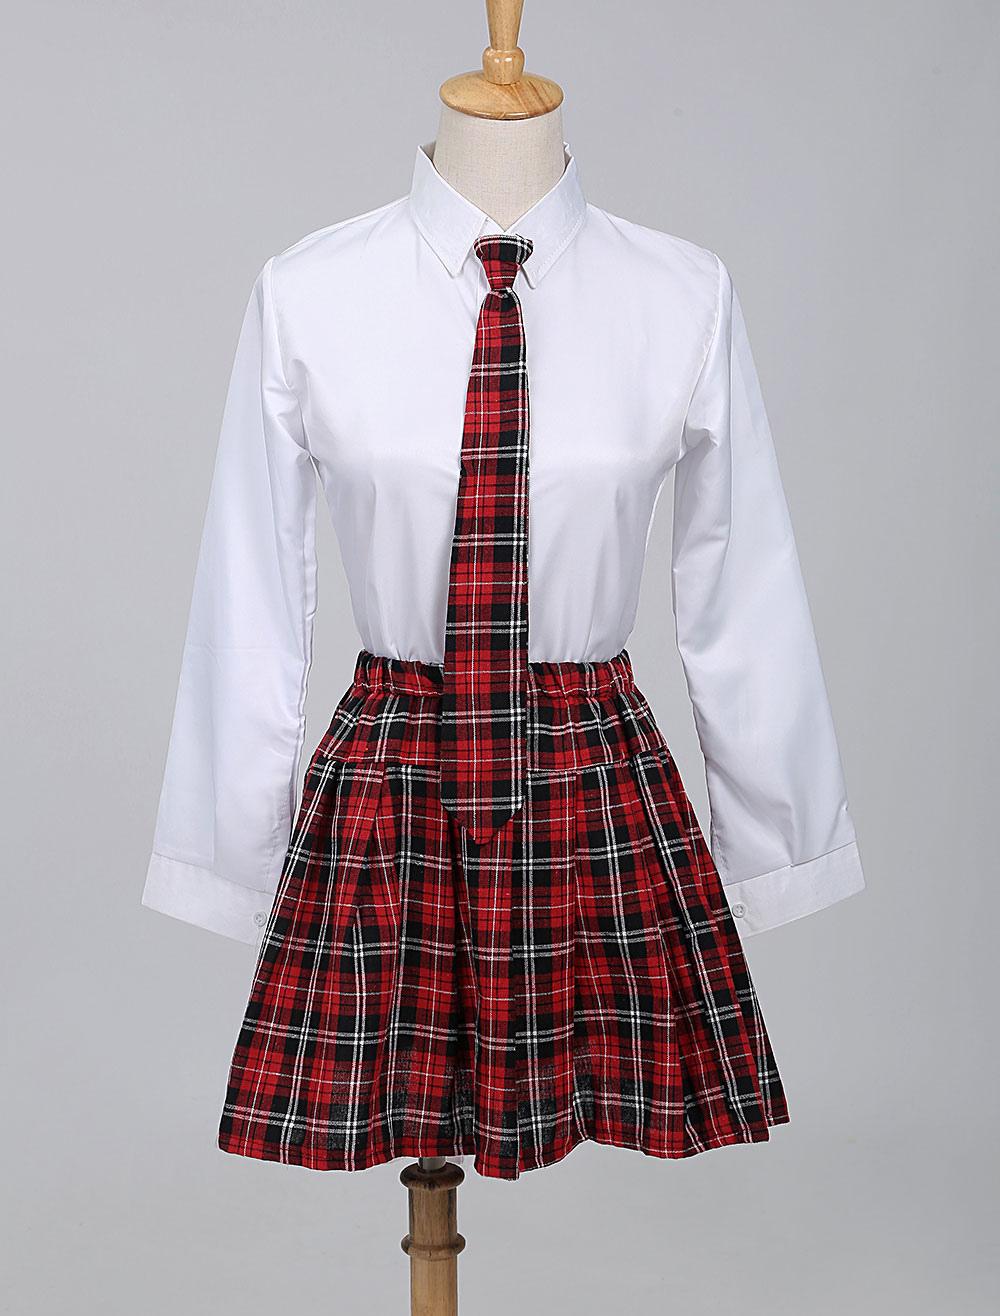 Anime School Girl Uniform Kawaii British School Uniform Suit